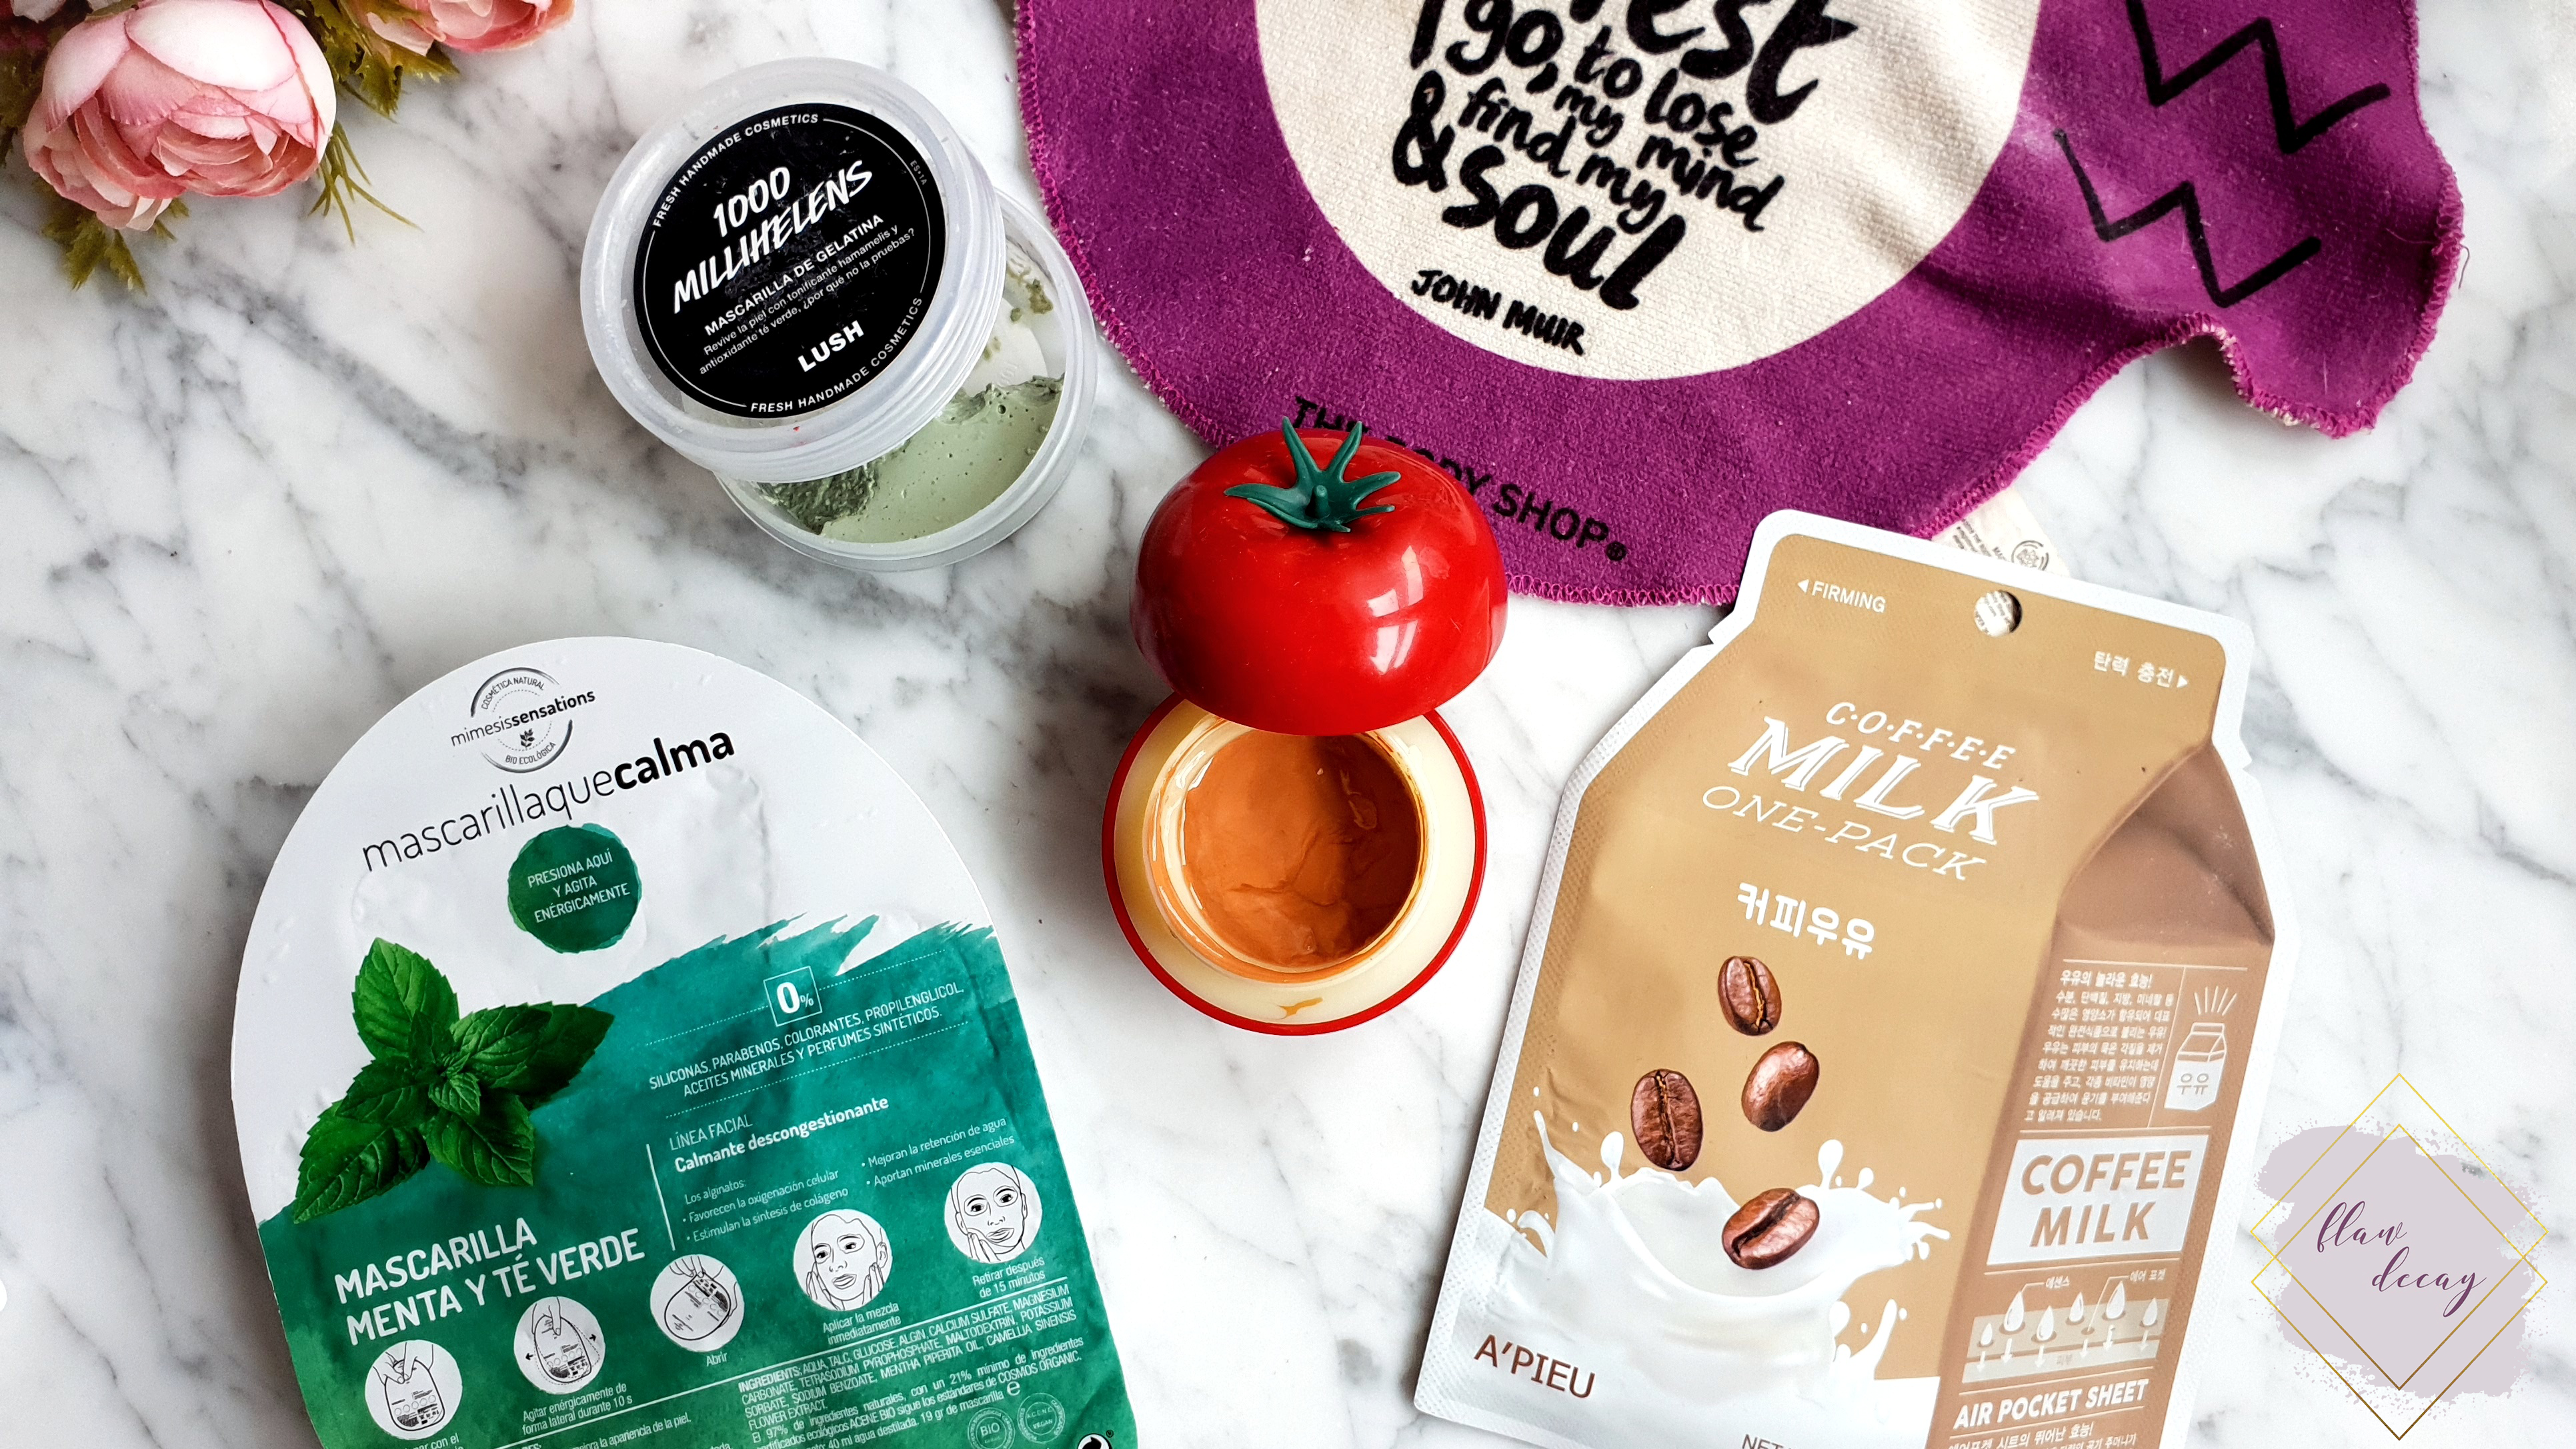 Lush (1000 Millihelens), Fancy Handy (Tomato Face Mask), A'PIEU (Coffee Milk Sheet Mask), Herbora (Menta y Té Verde) Masks - 100% Cruelty-free Morning/Night Skincare Routine